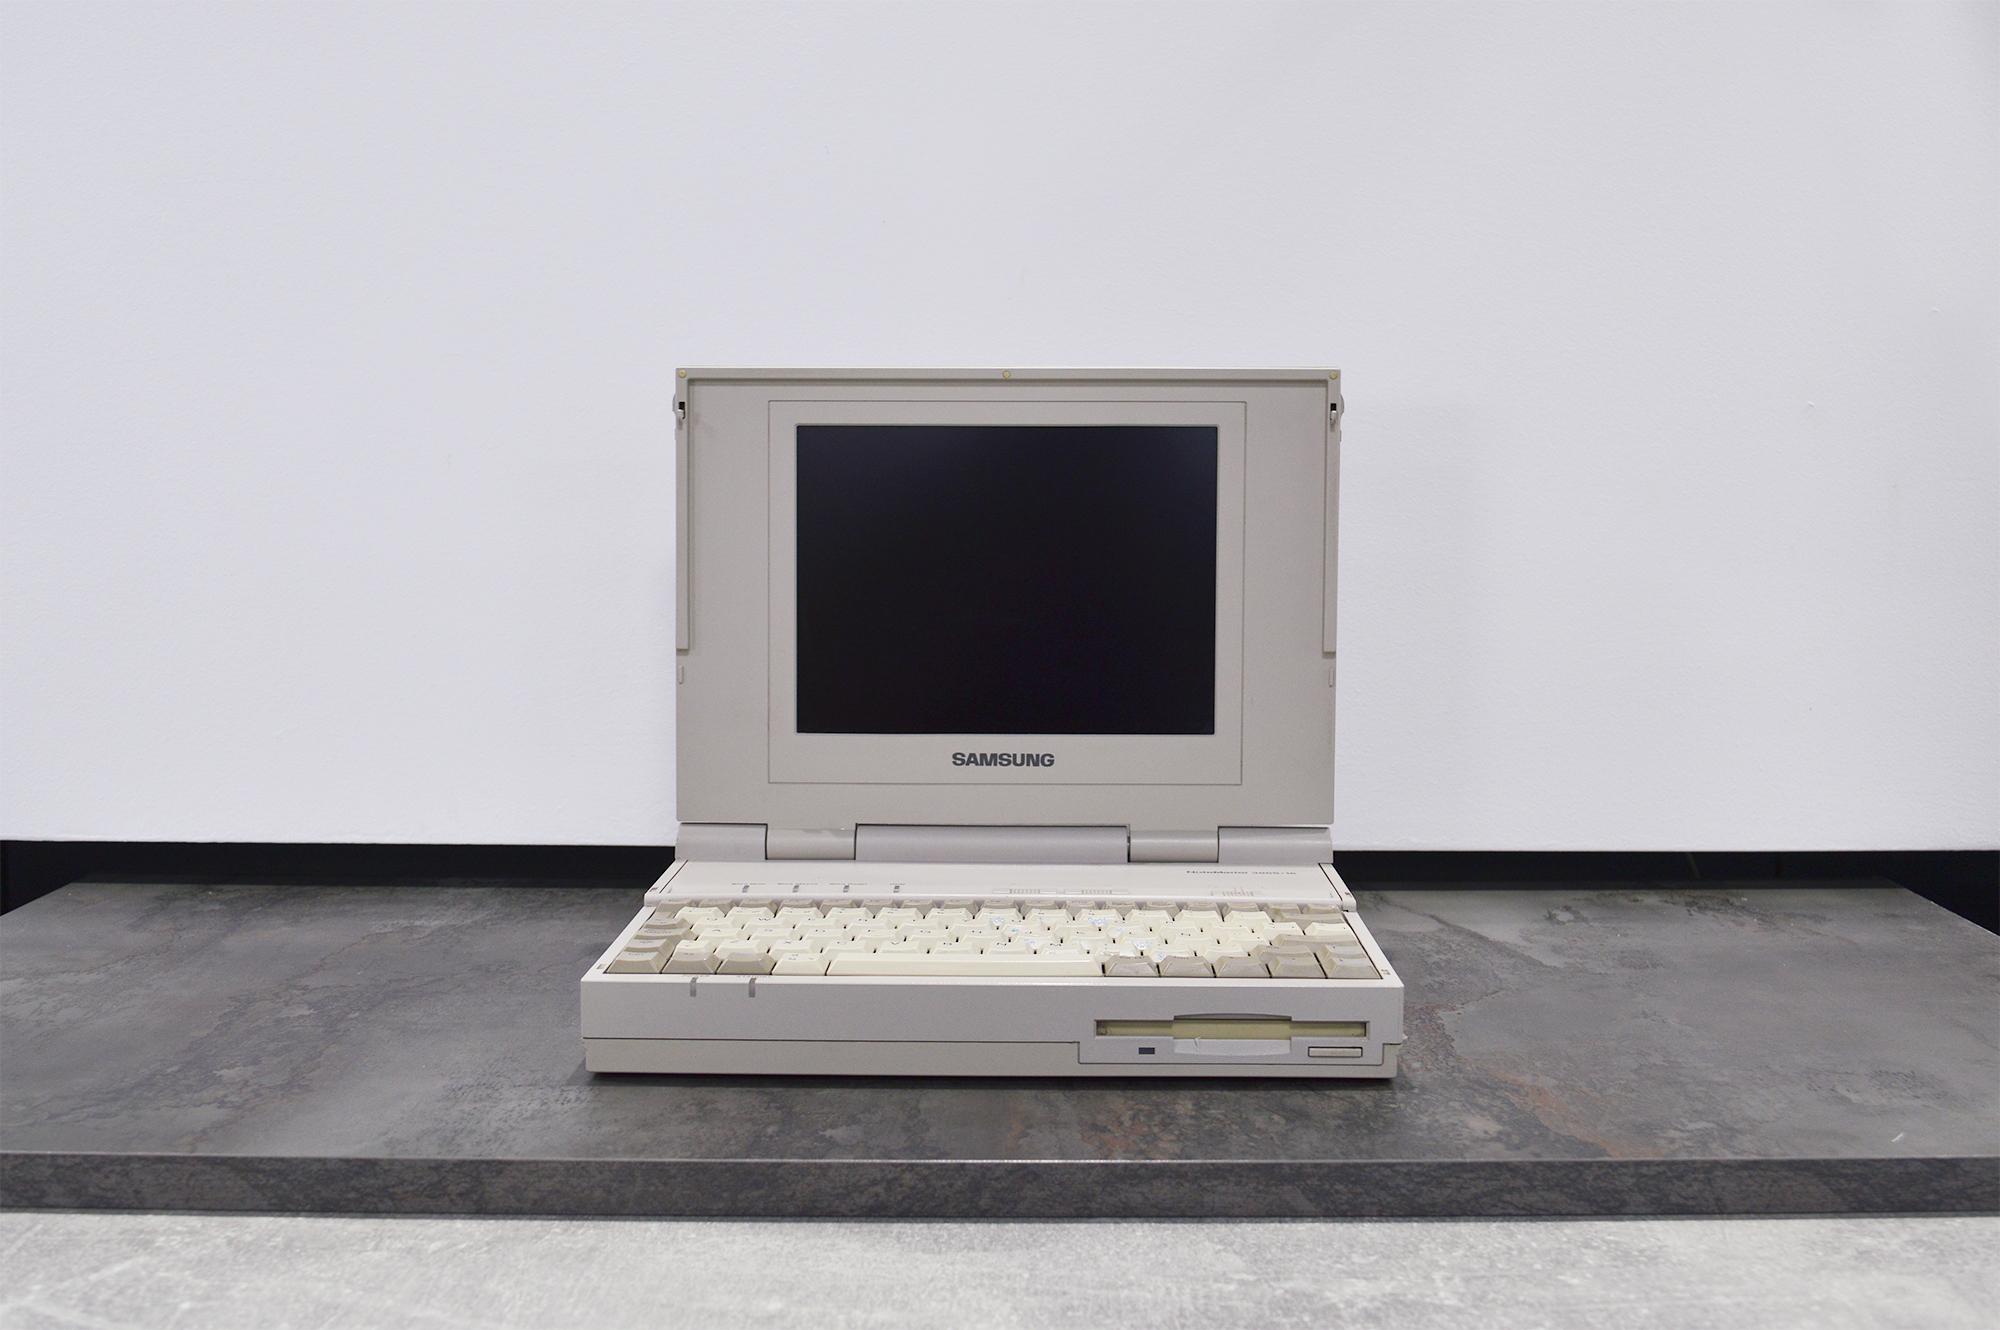 Smsung_laptop_1